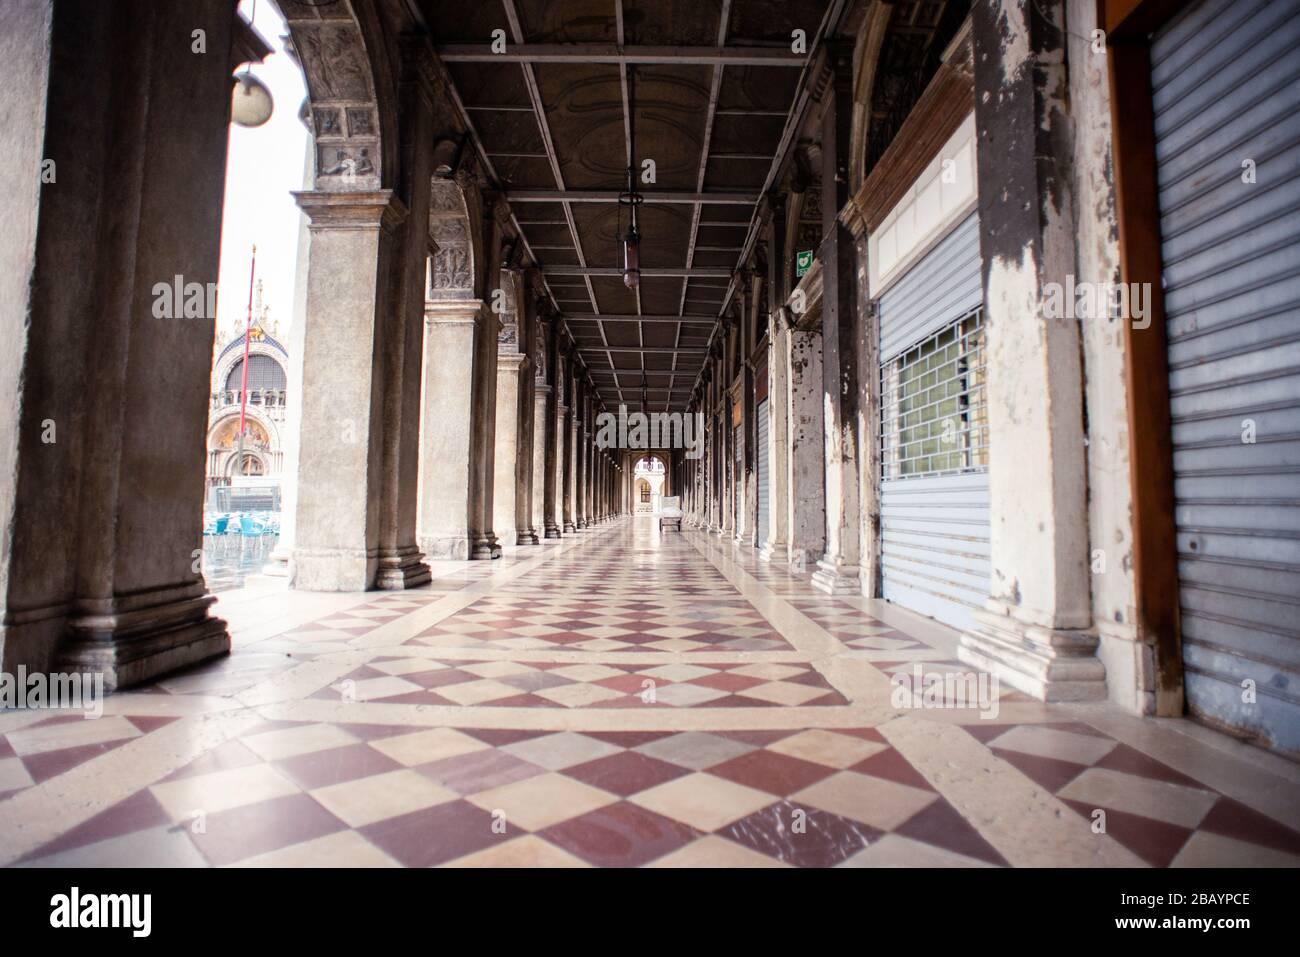 Venedig. Italien - 15. Mai 2019: Arkaden der Procuratie Vecchie in Venedig am Markusplatz. Italien. Am Frühen Morgen. Geschlossene Restaurants und Geschäfte. Stockfoto